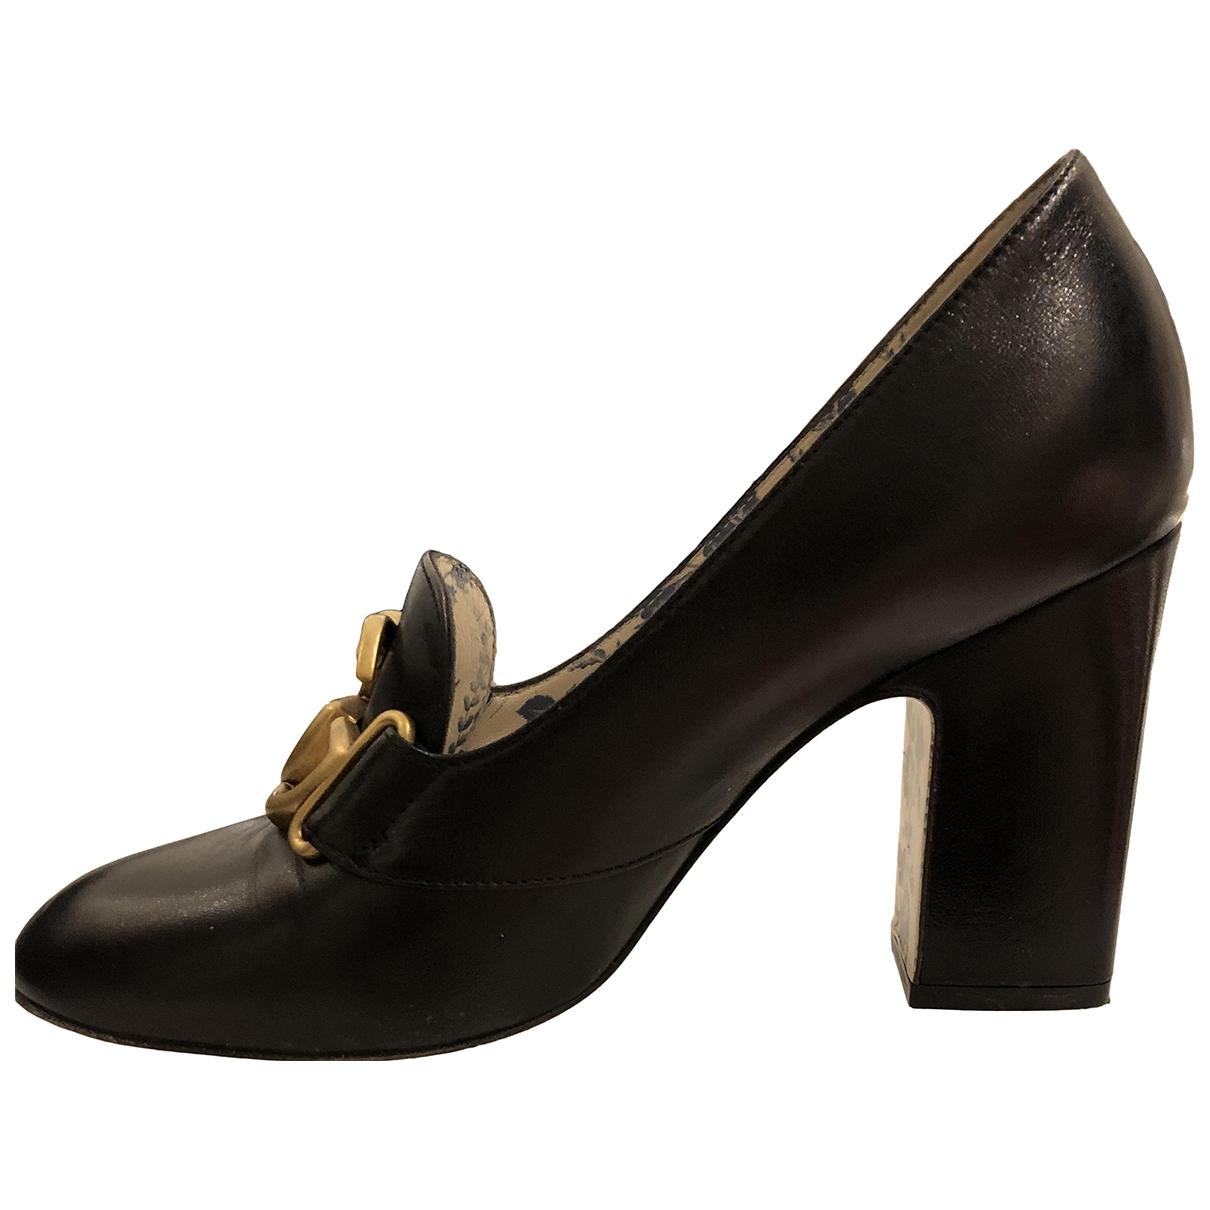 Gucci \N Black Leather Heels for Women 36 EU